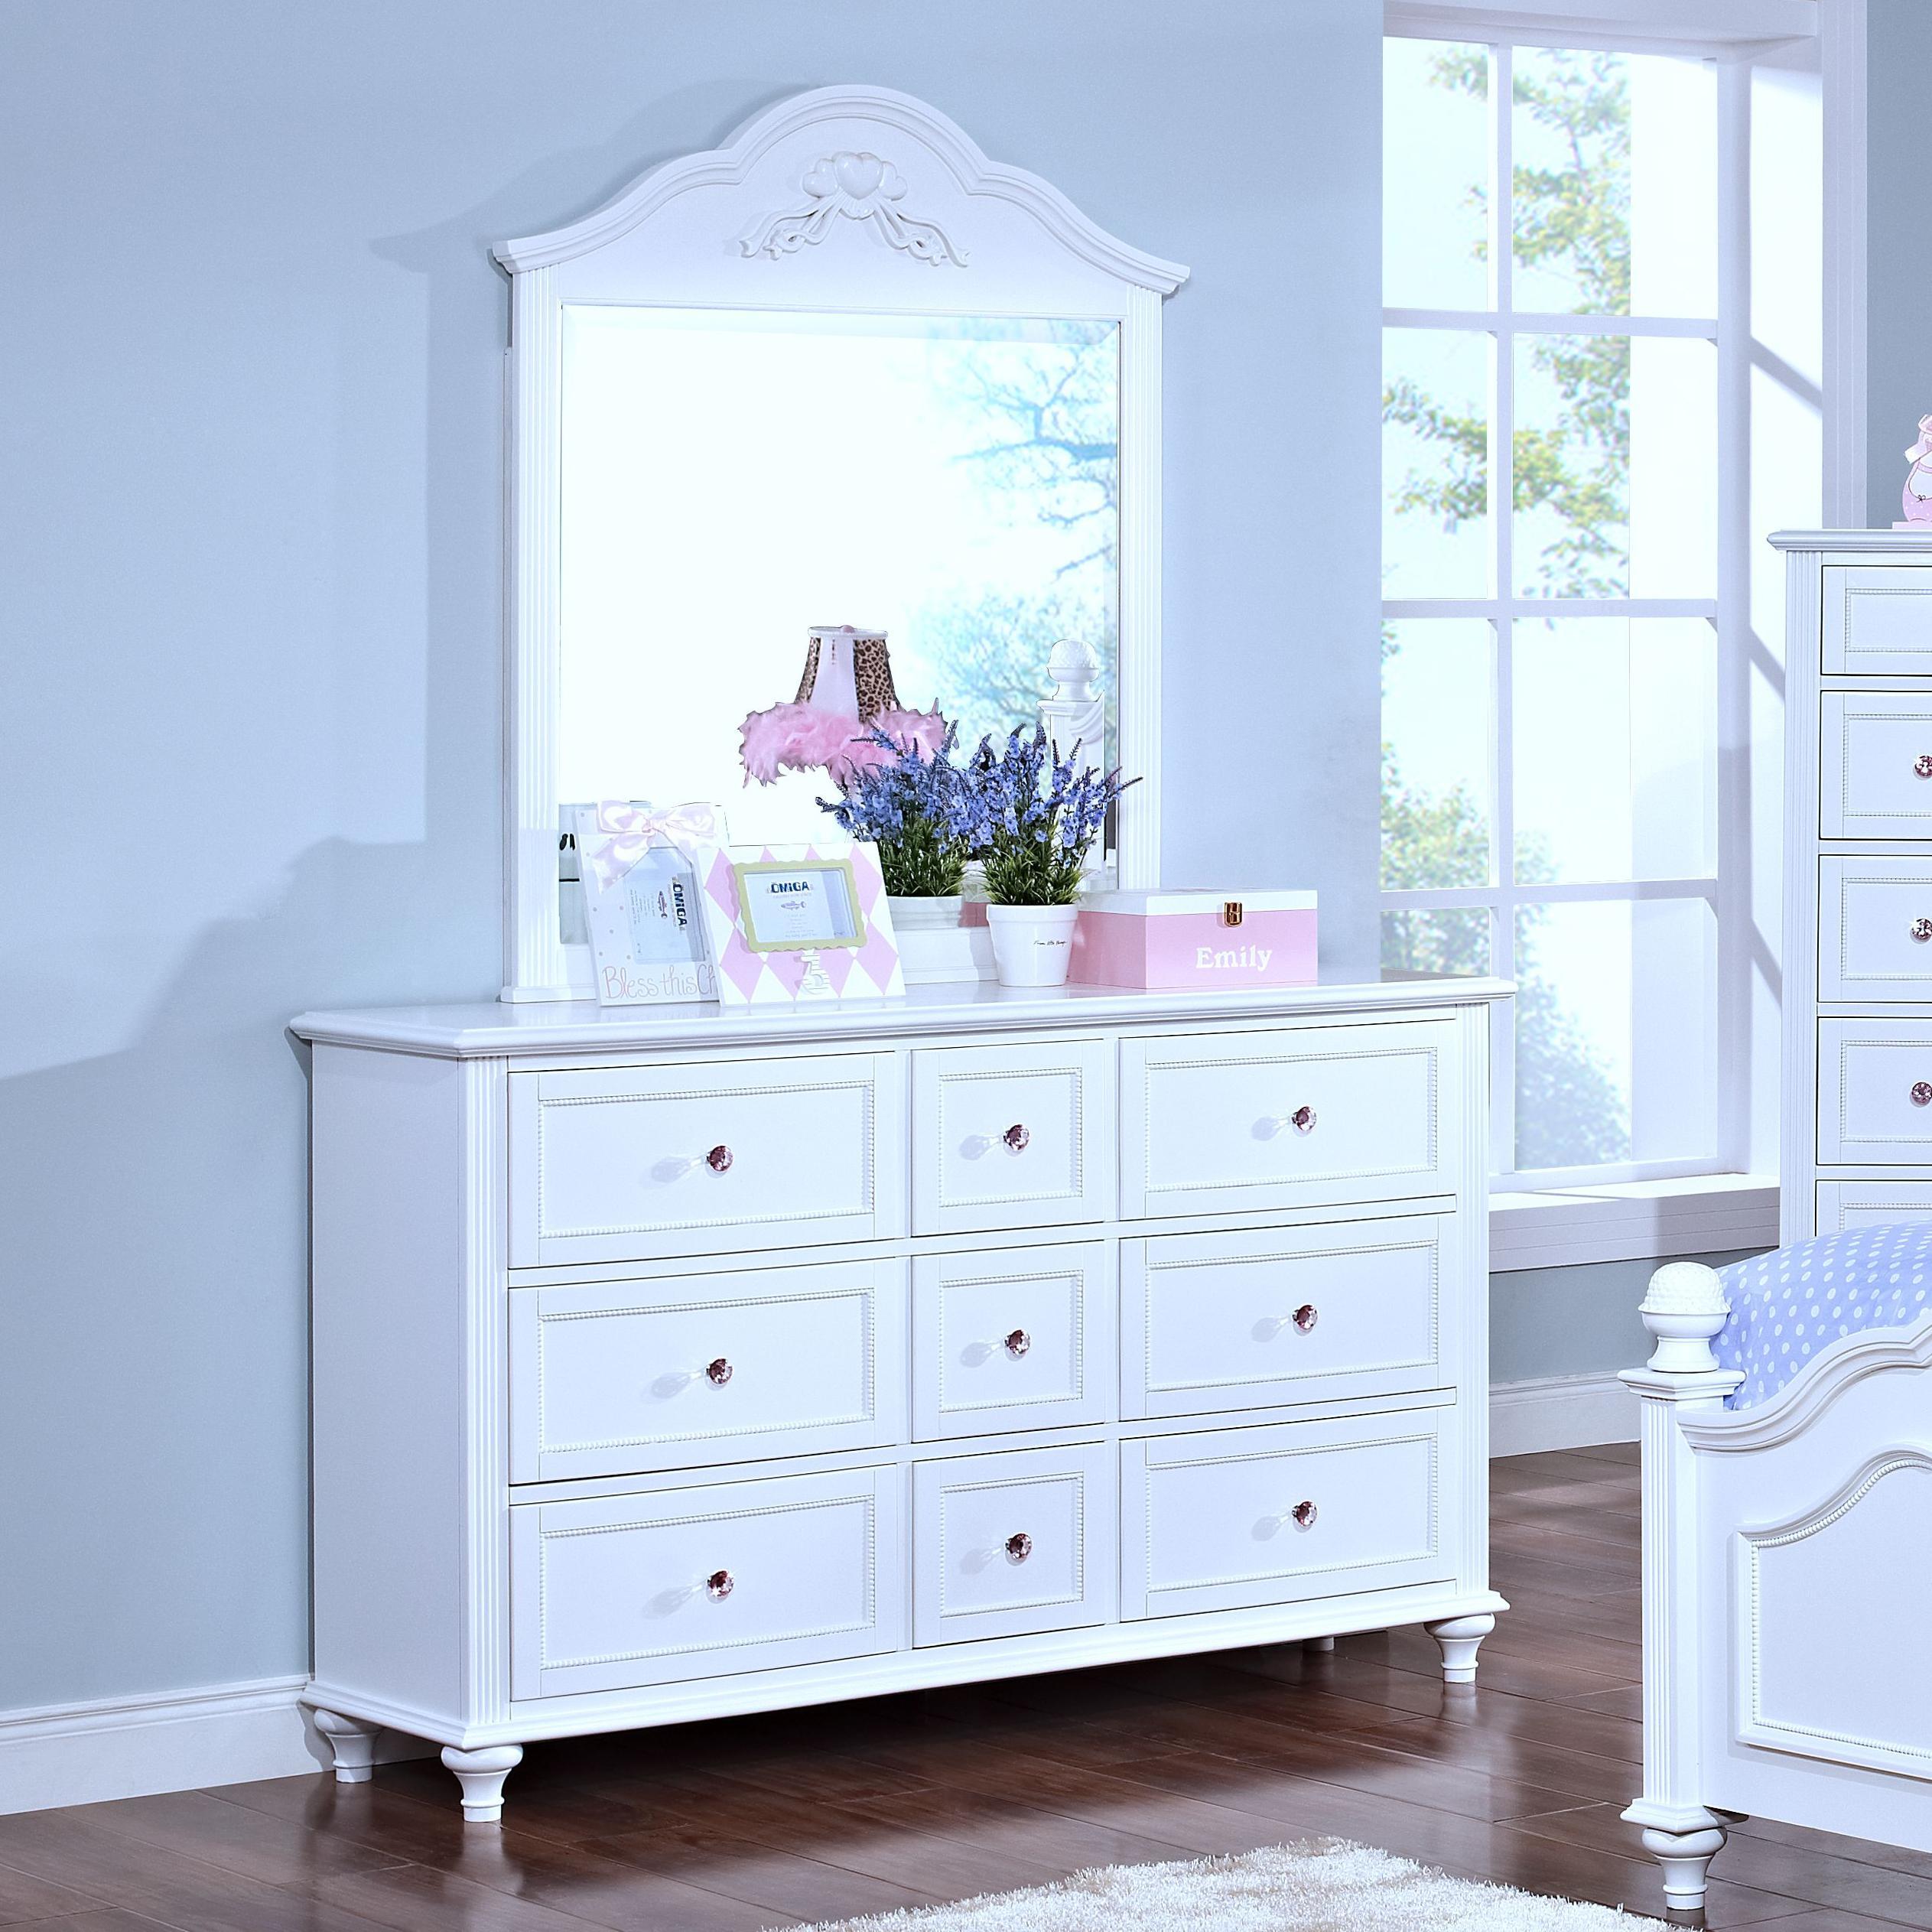 New Classic Megan Dresser and Mirror  - Item Number: 05-242-052+062